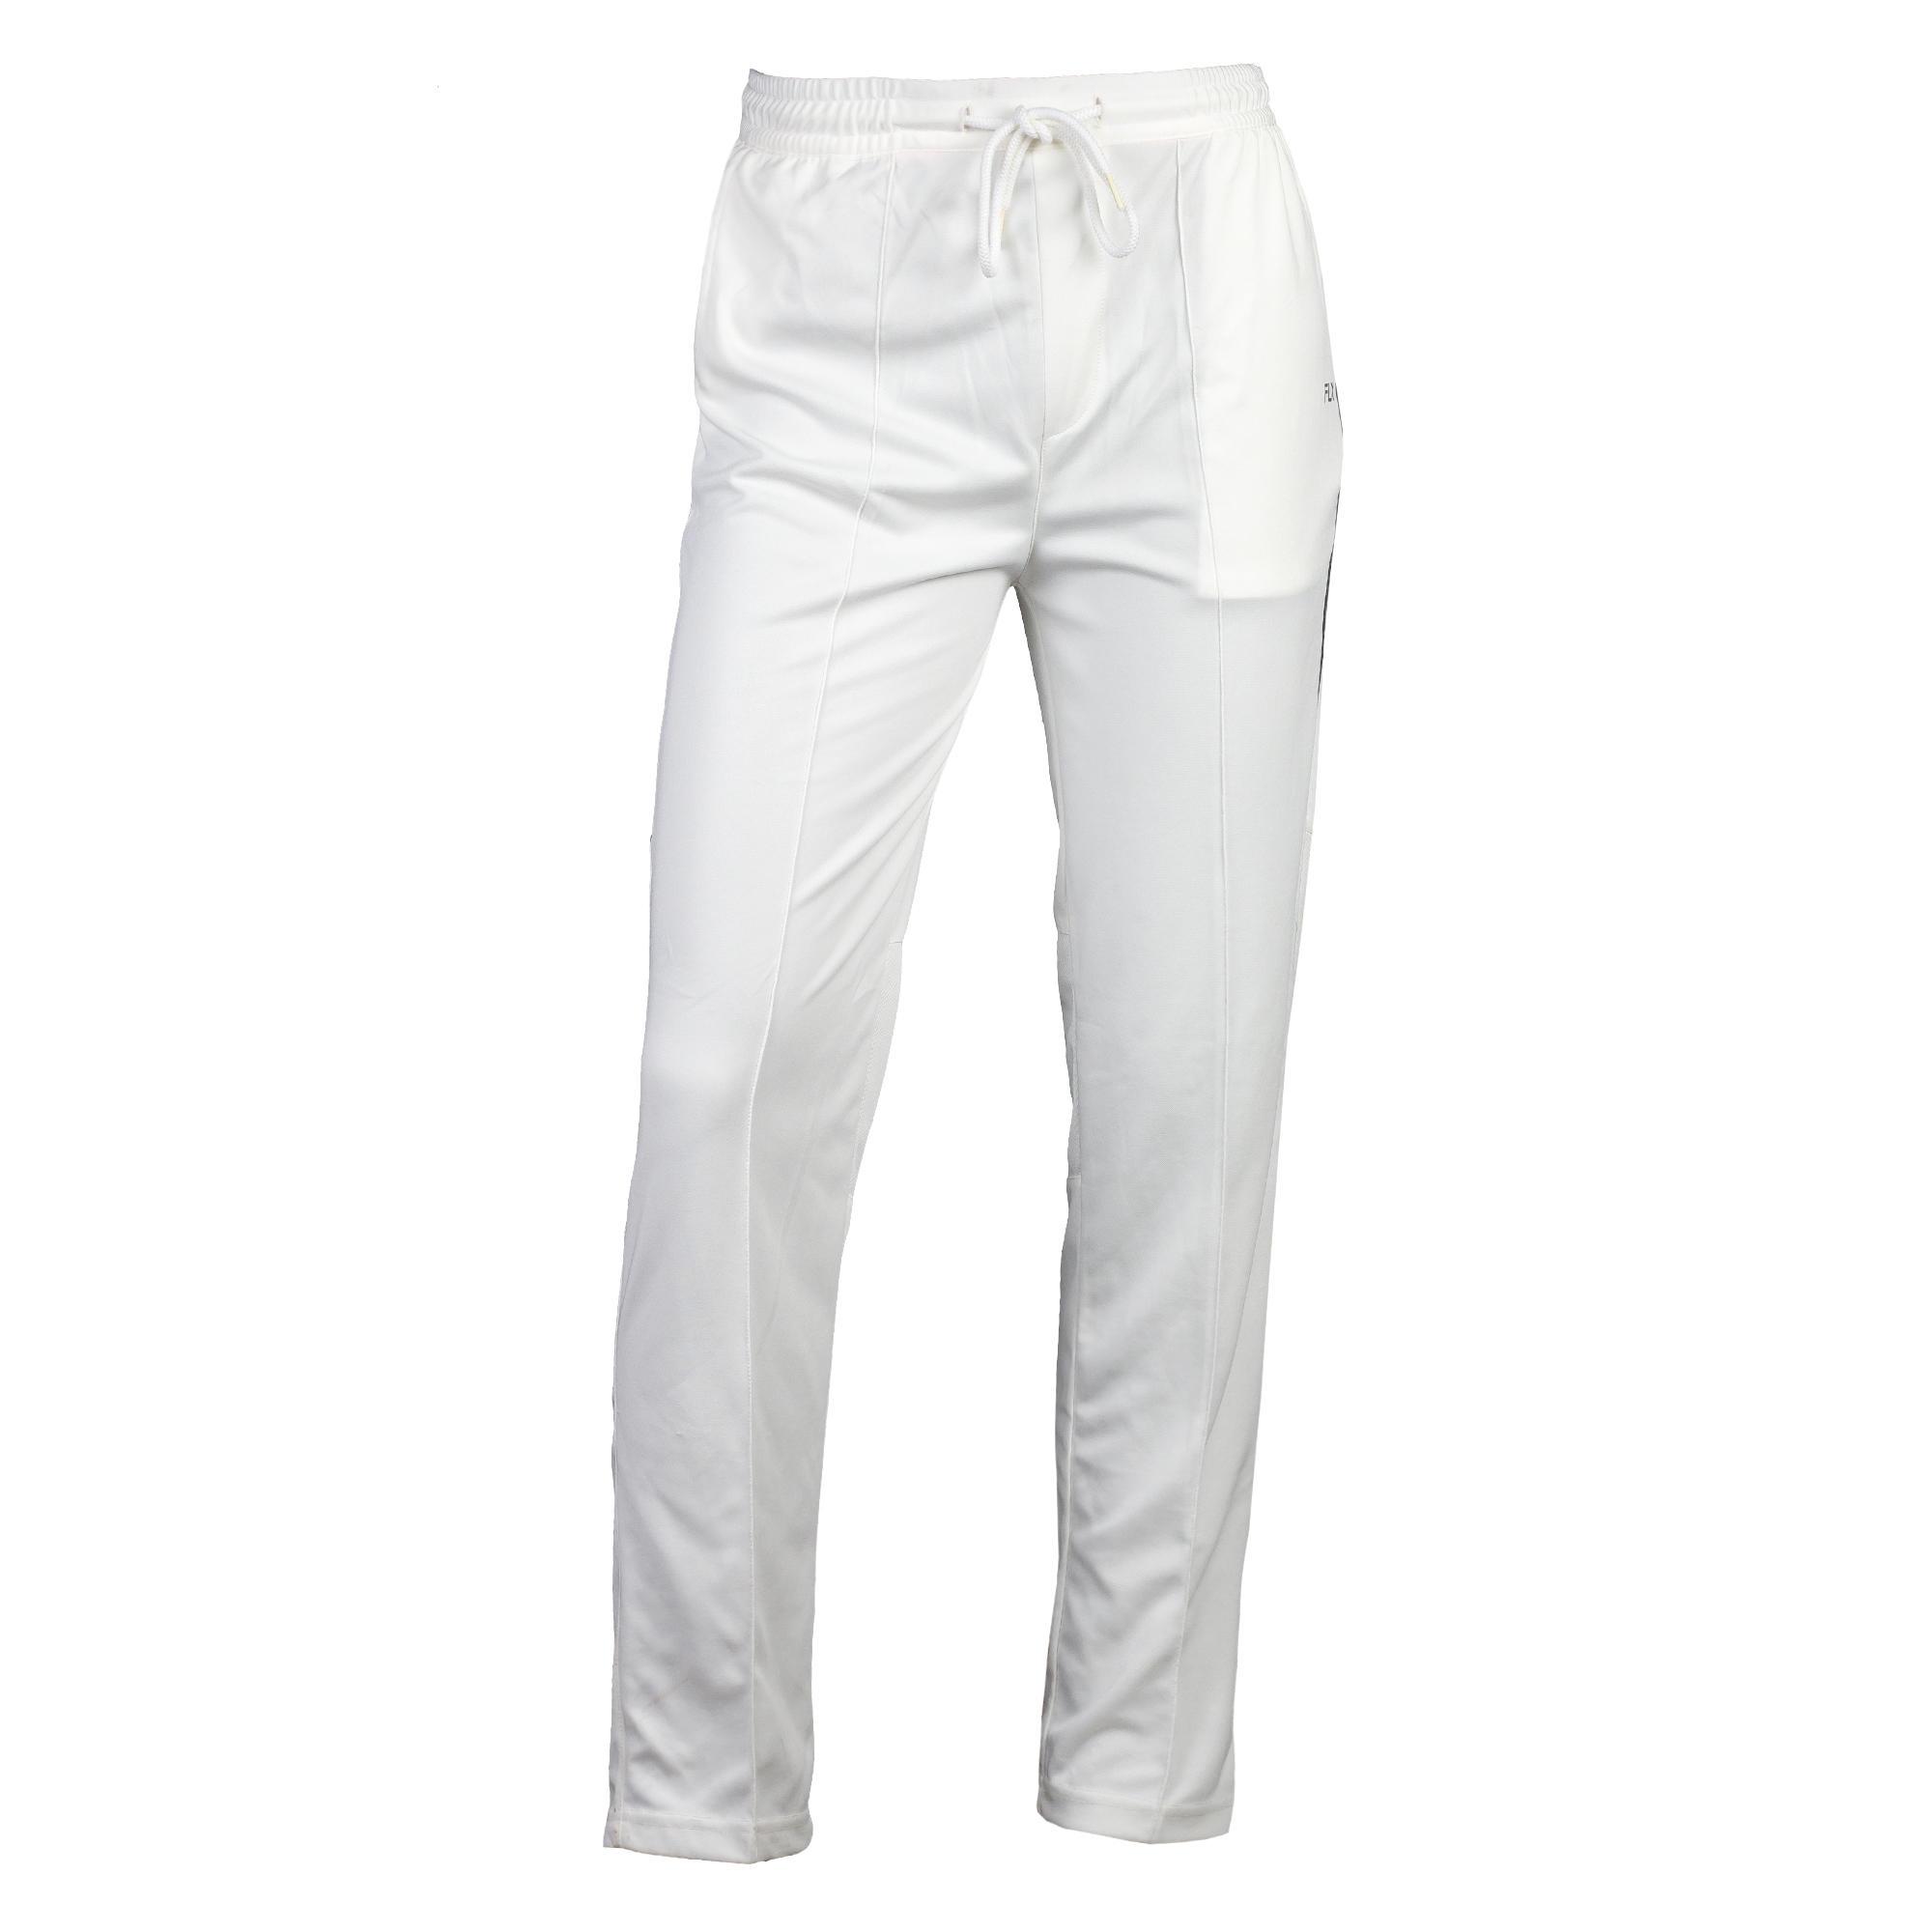 WHITE TROUSER TR 920